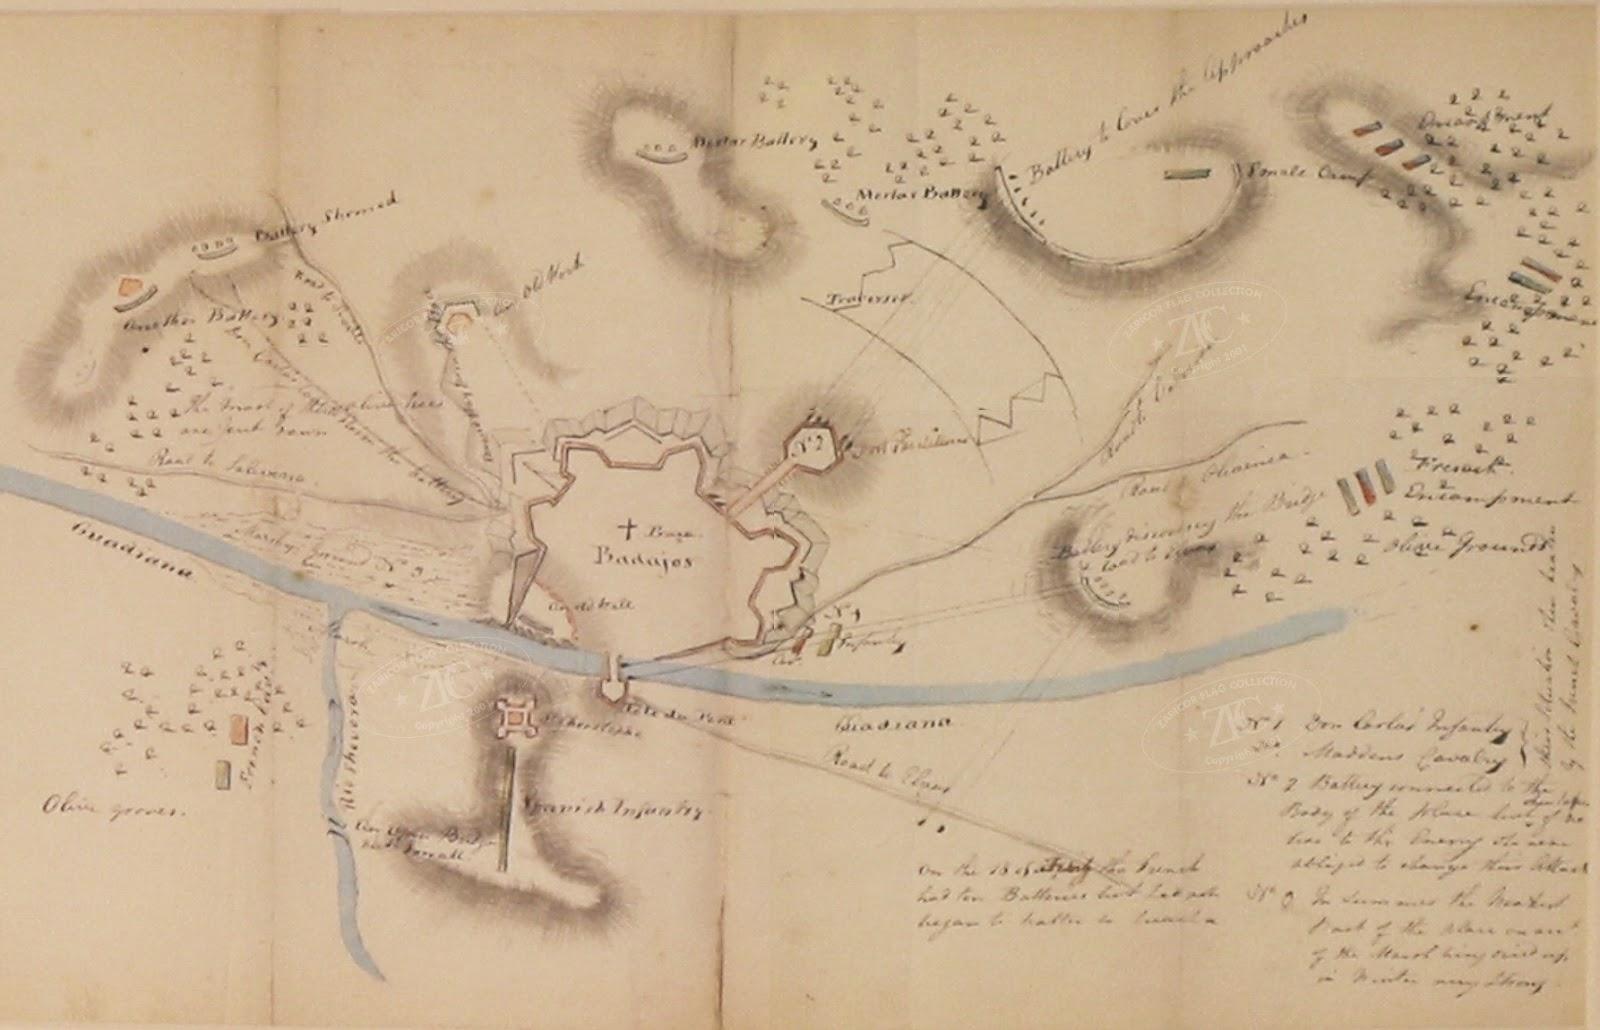 Badajoz 1811-1812: Map of Siege of Badajoz, Spain 1812